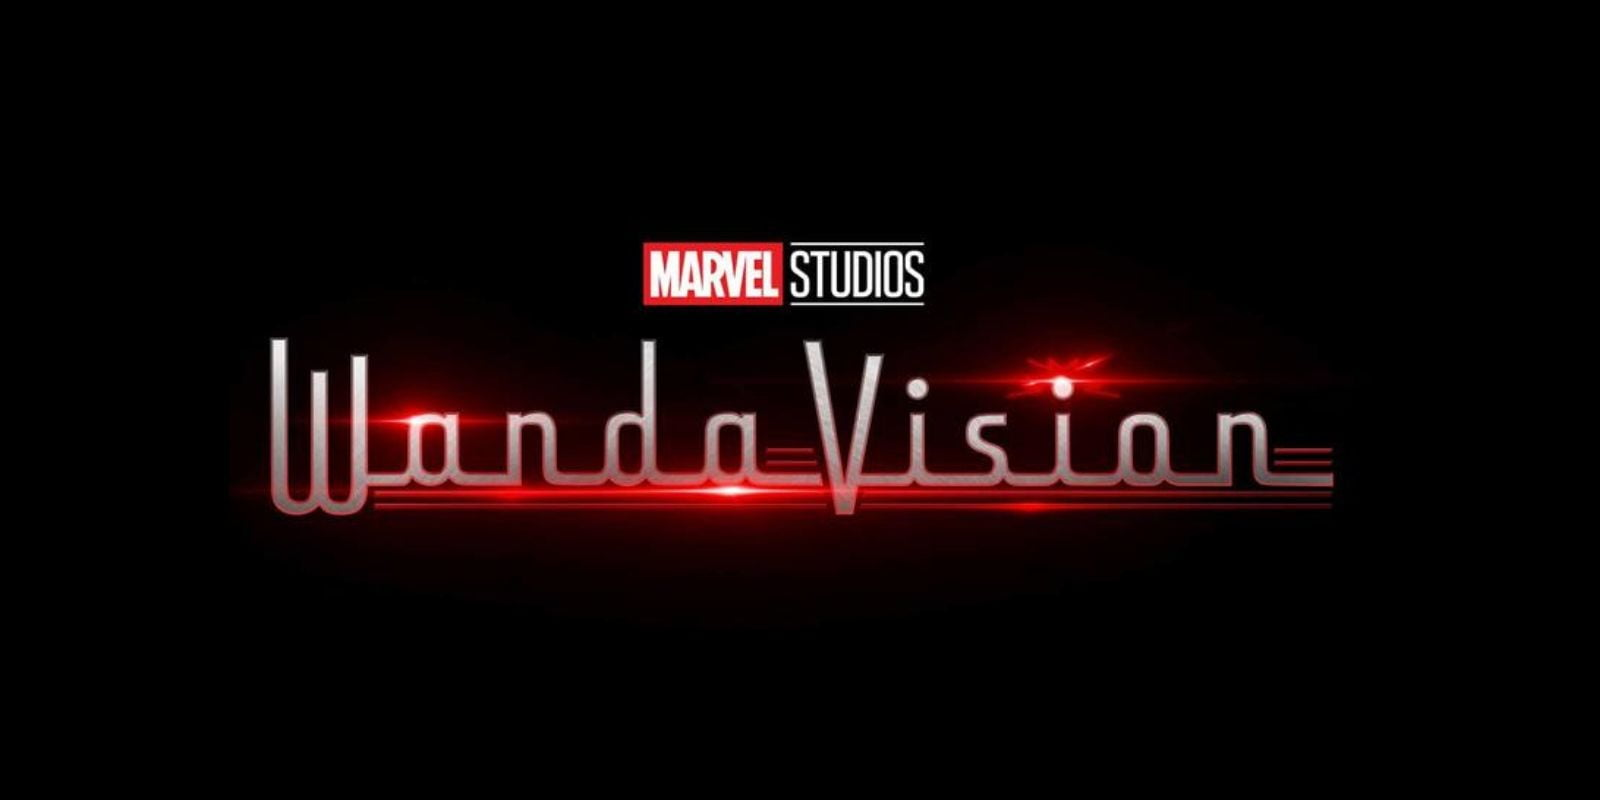 WandaVision Disney+ show logo